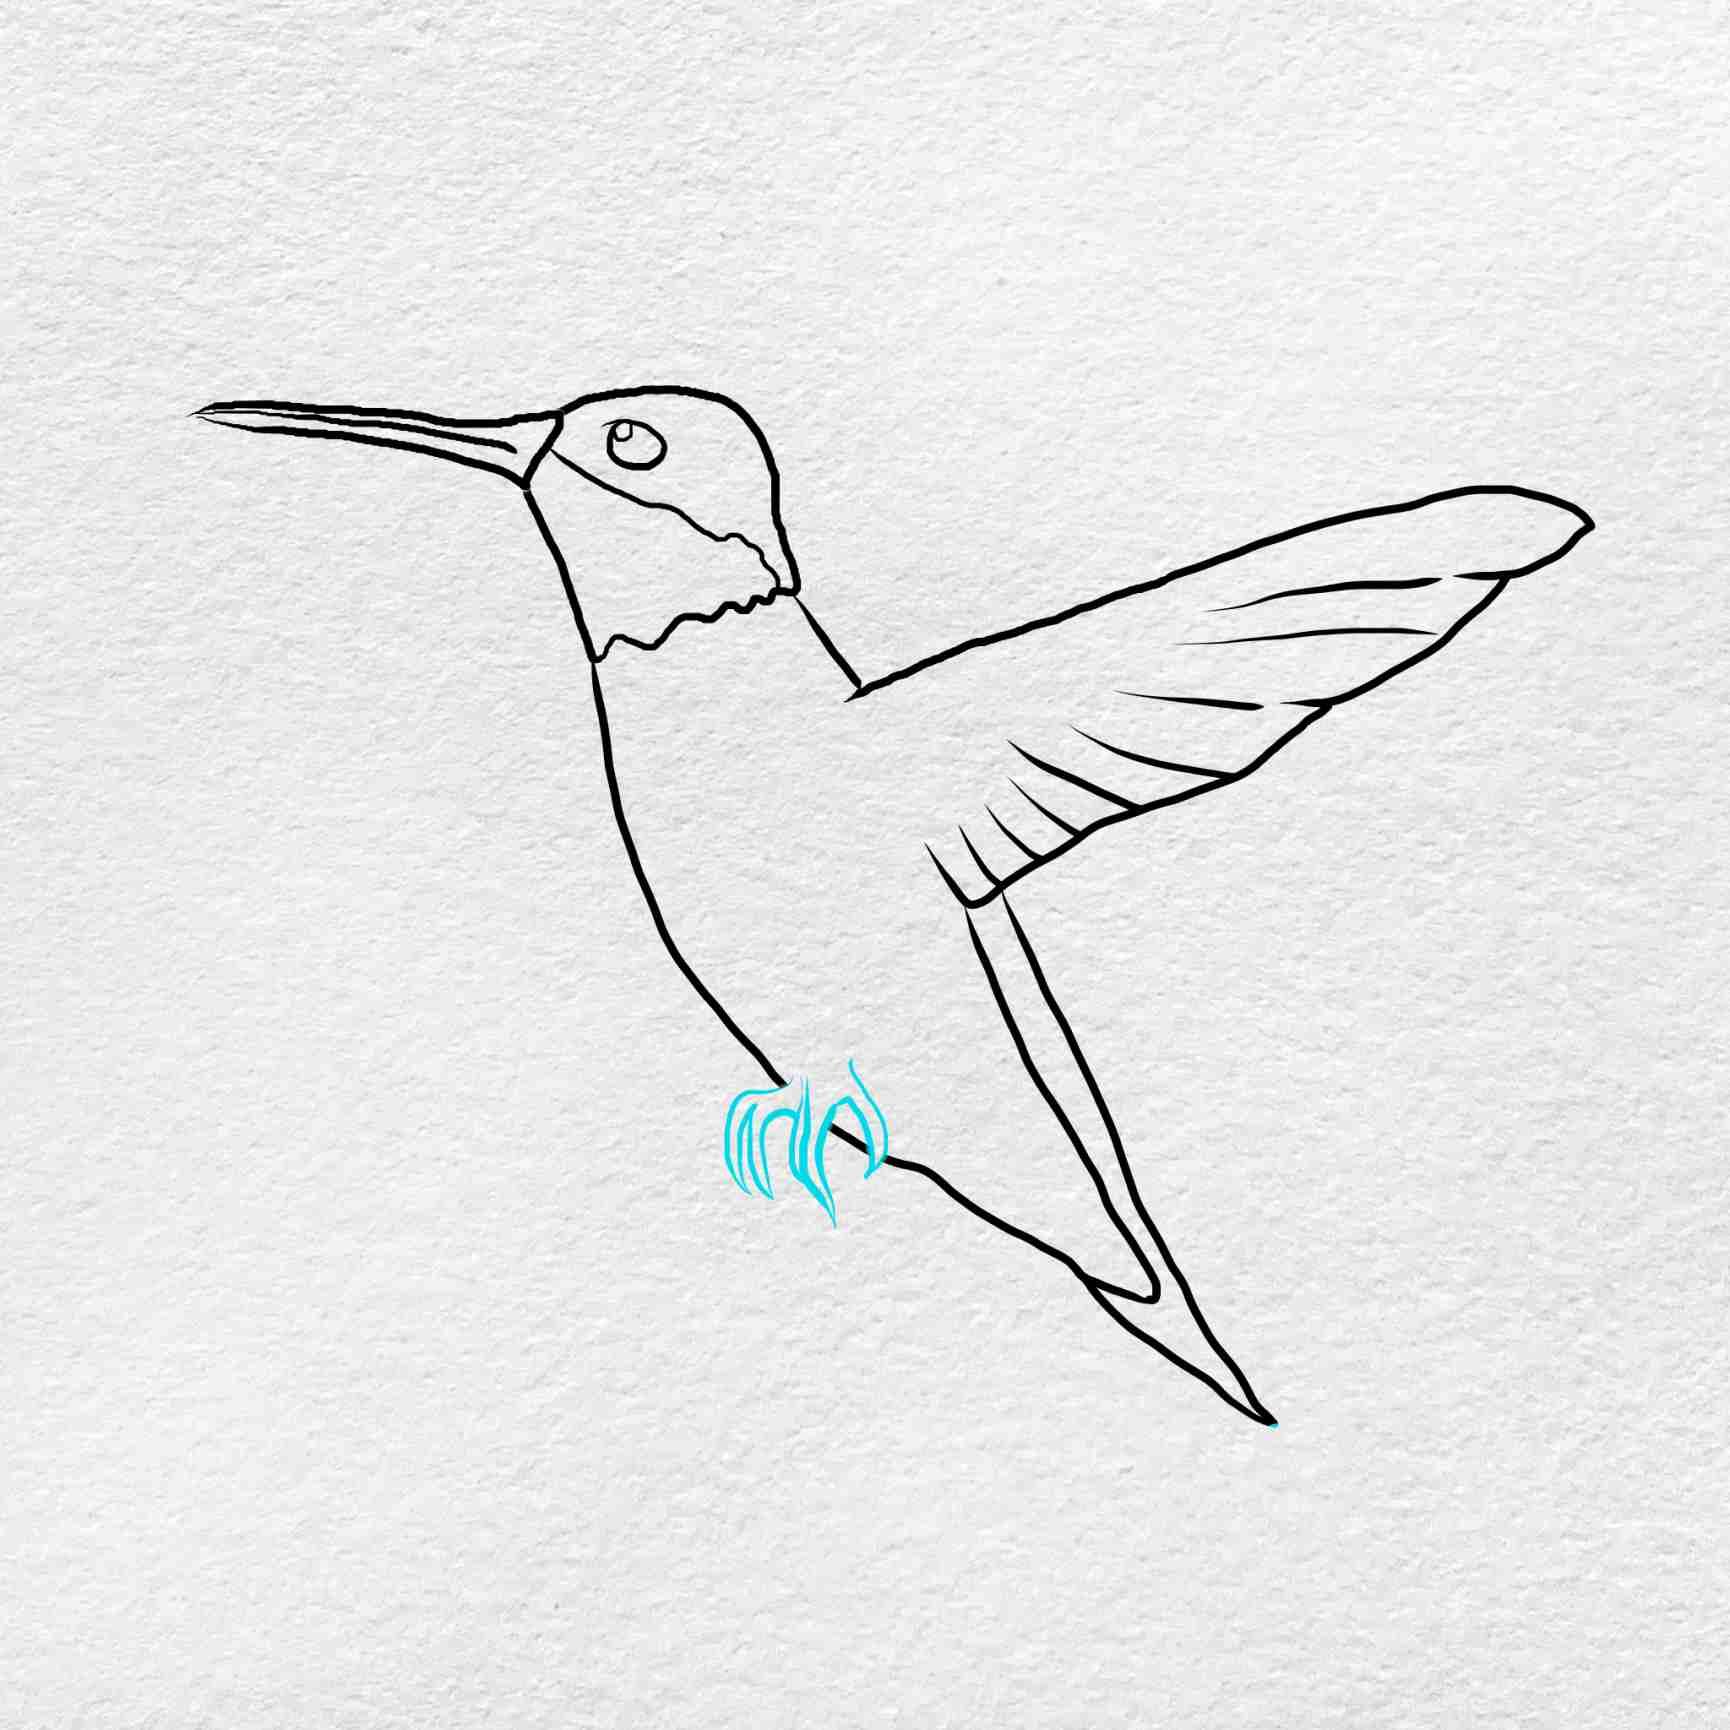 How To Draw Hummingbird: Step 5